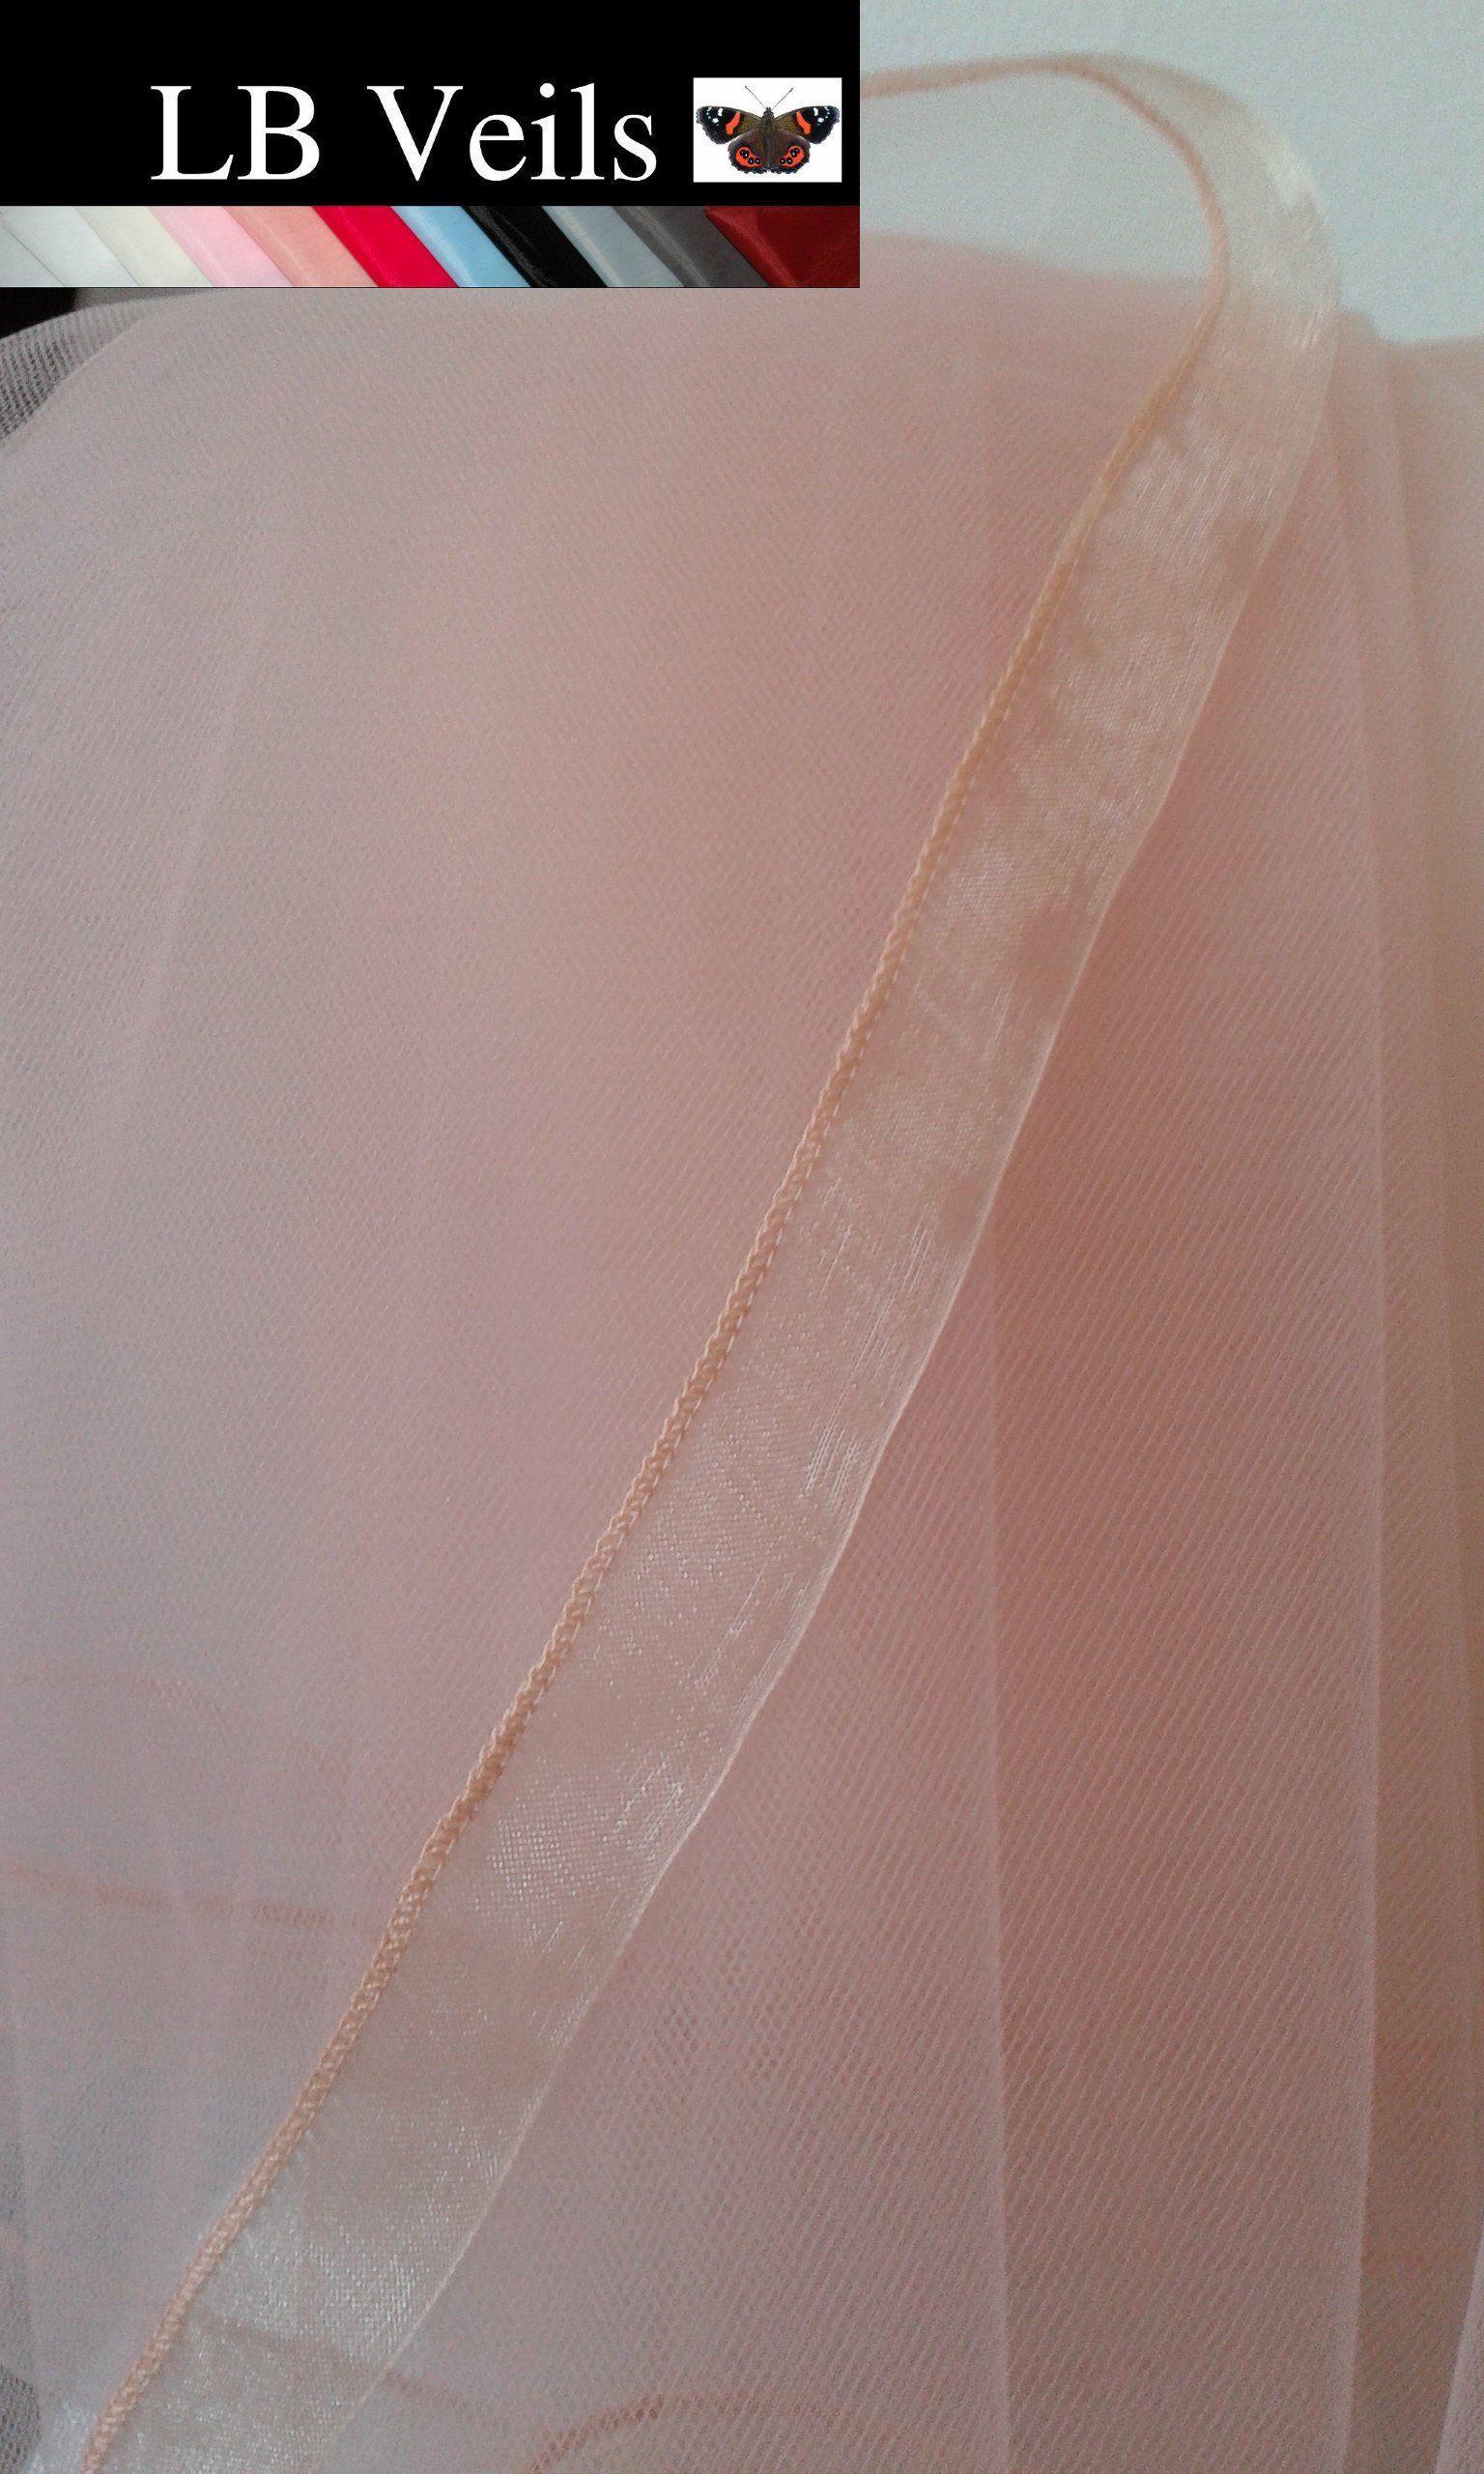 Waist Any Ribbon Veil Fingertip Colour Pink LB Veils LBV184 UK Edge Organza Elbow Length 2 Tier Floor Blush Bridal Wedding